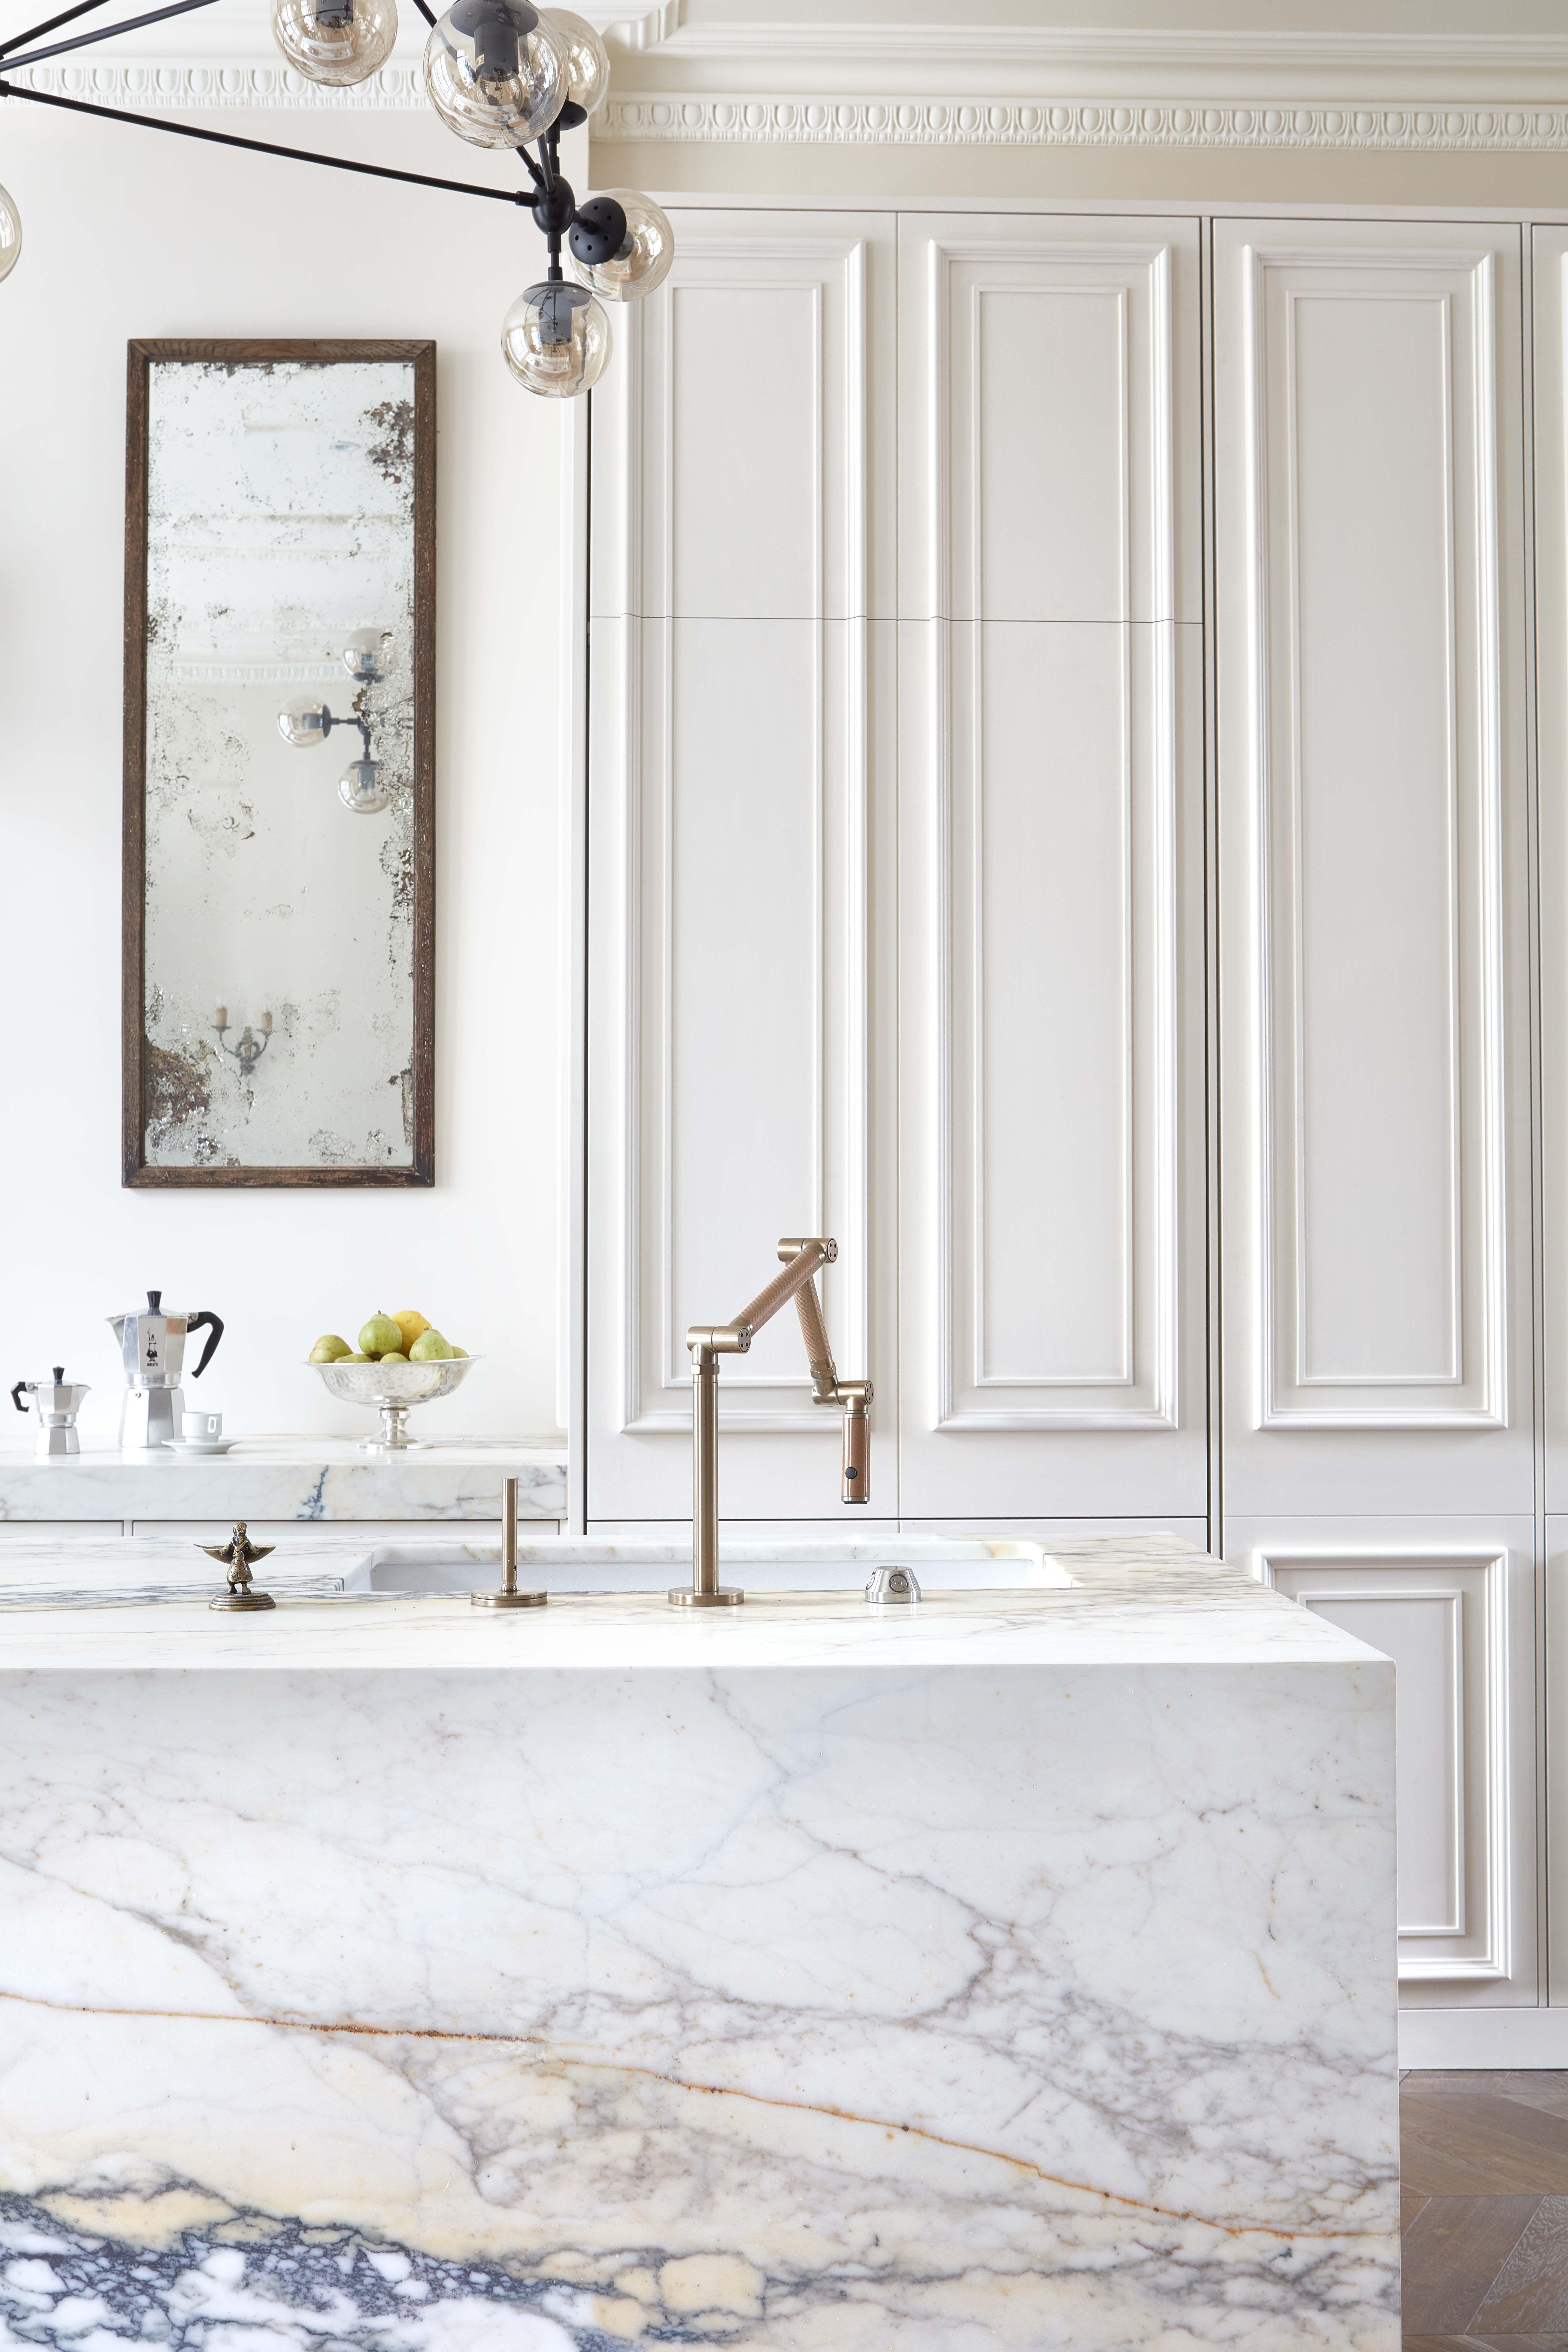 modo chandelier, antique mirror, brass tap, paonazzo marble ...